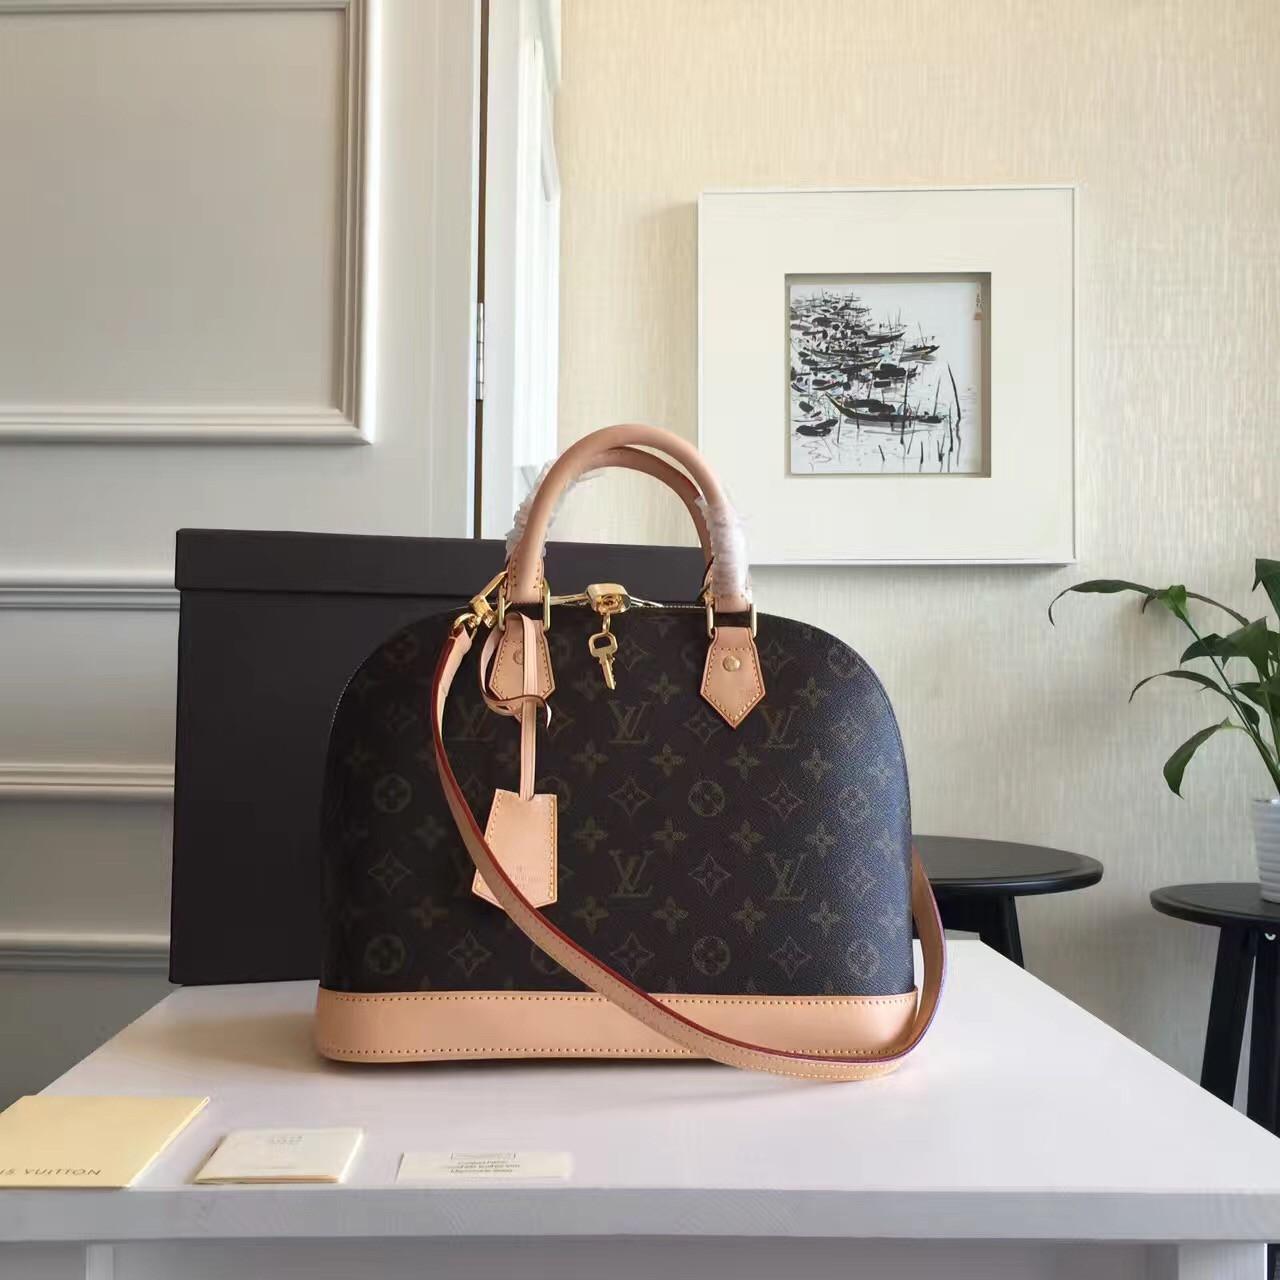 b0230d947bd7 Сумки копии интернет магазин - Louis Vuitton копия | vkstore.com.ua